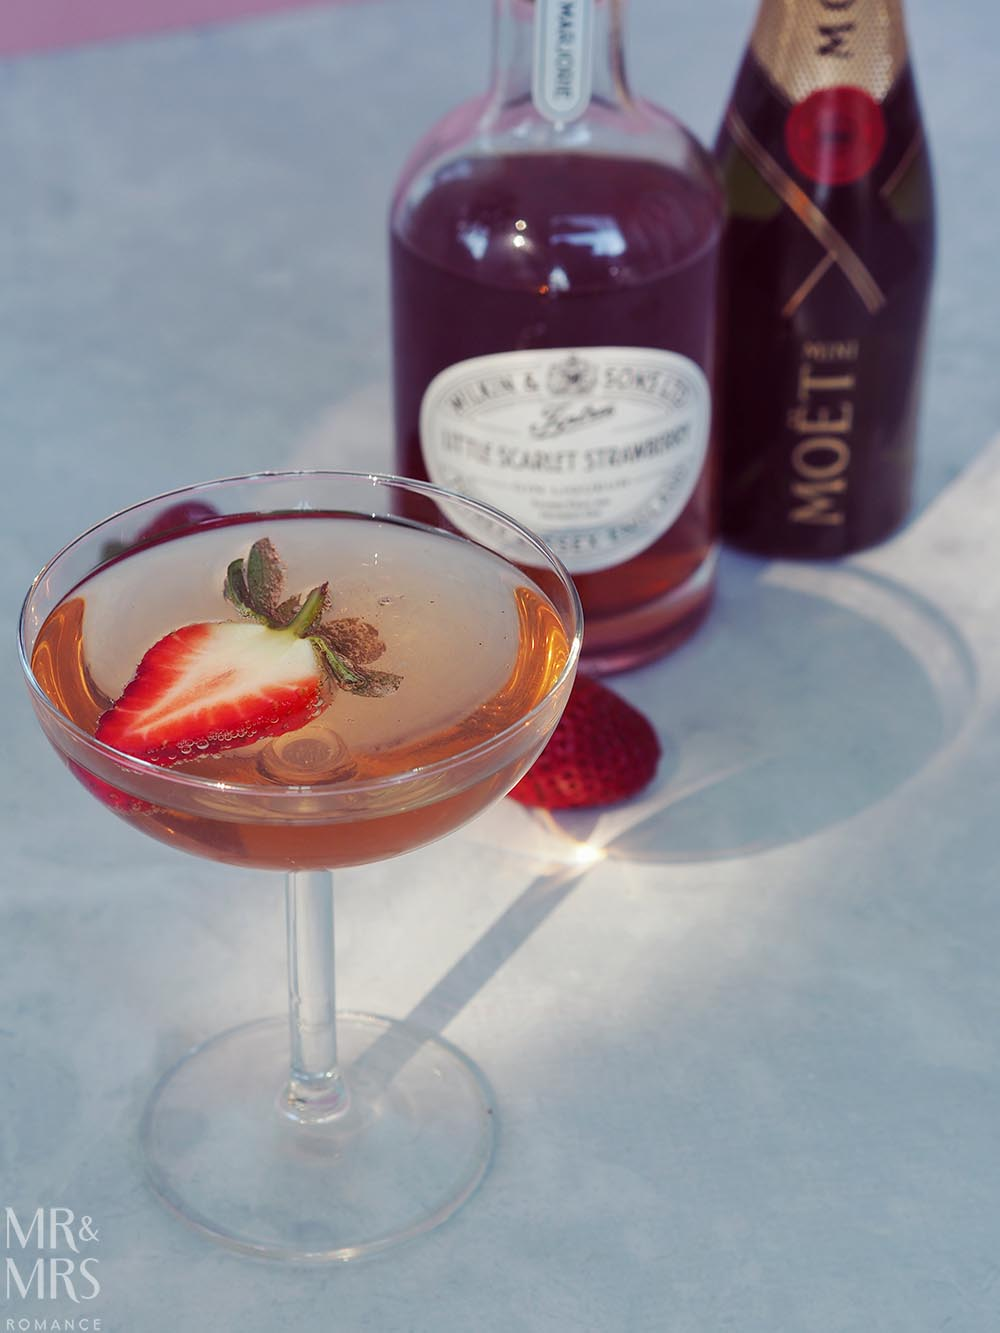 Wilkin Estates Tiptree Jam Co - Little Scarlet strawberry gin liqueur - gin royale